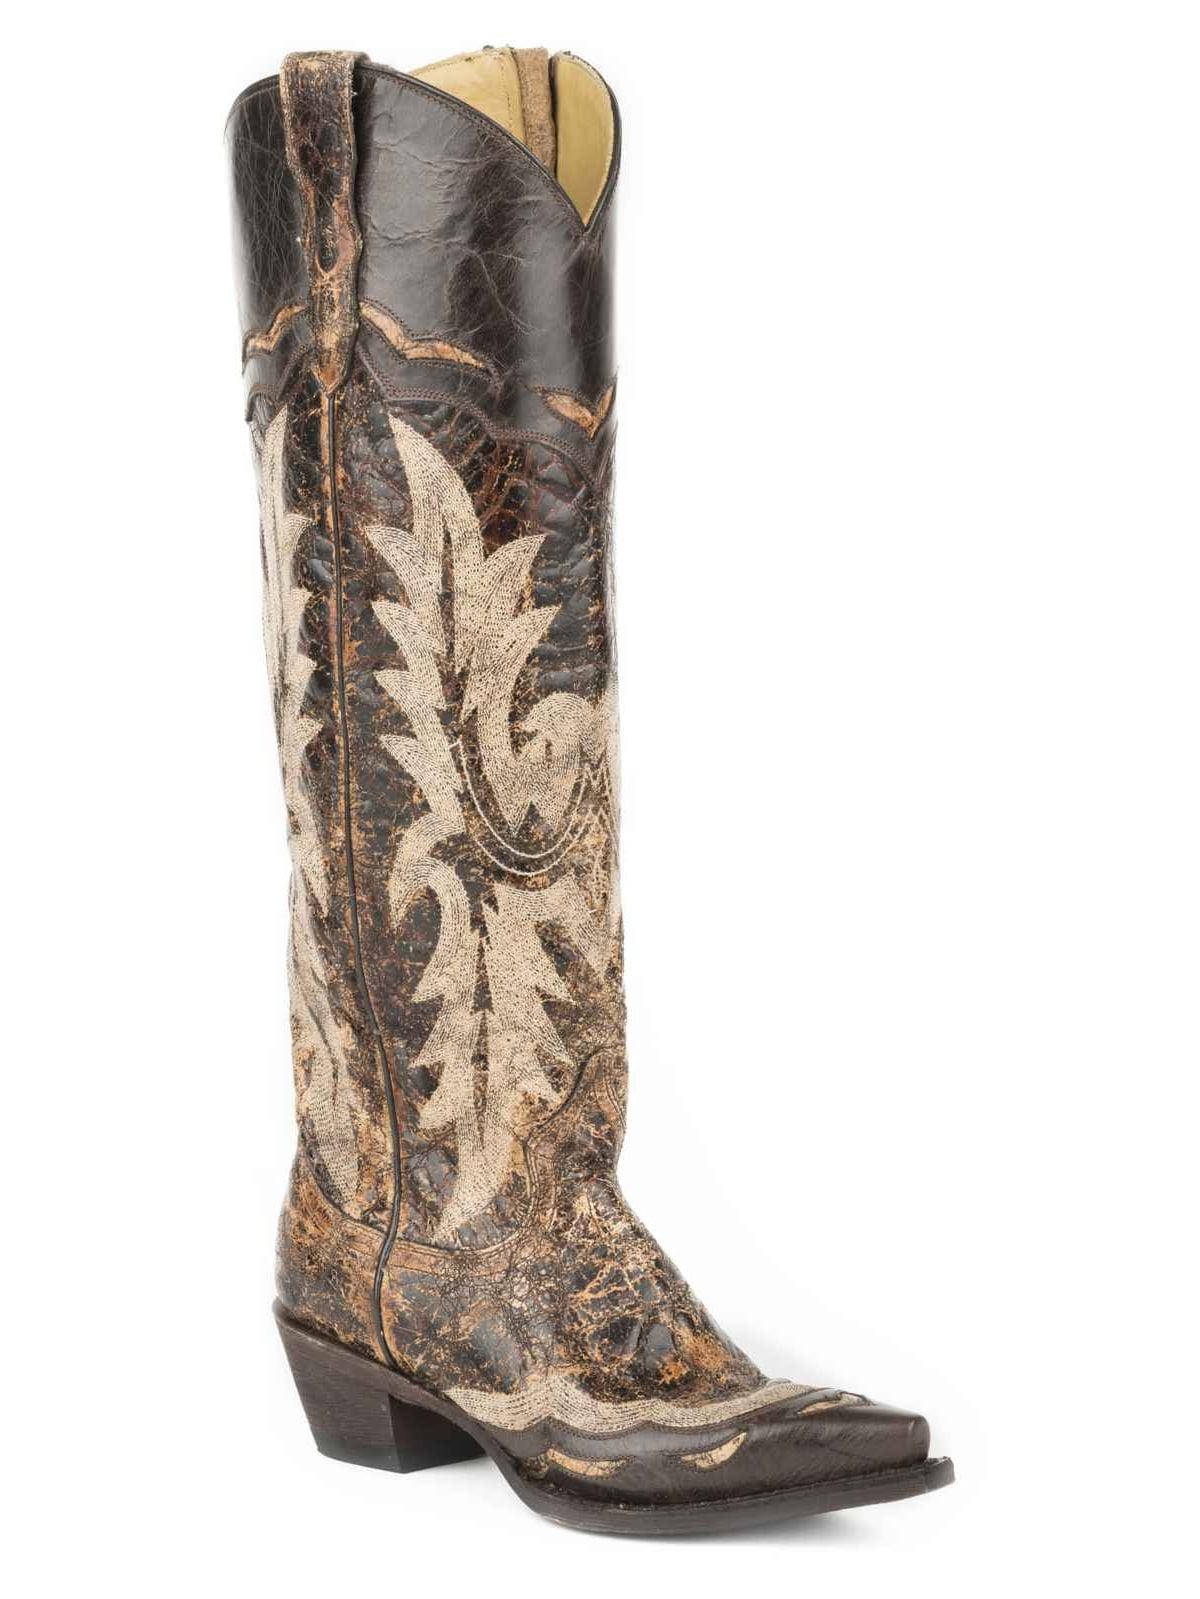 Stetson Women's Sadie Goat Side Zip Western Boot Snip Toe - 12-021-9105-0105 Br